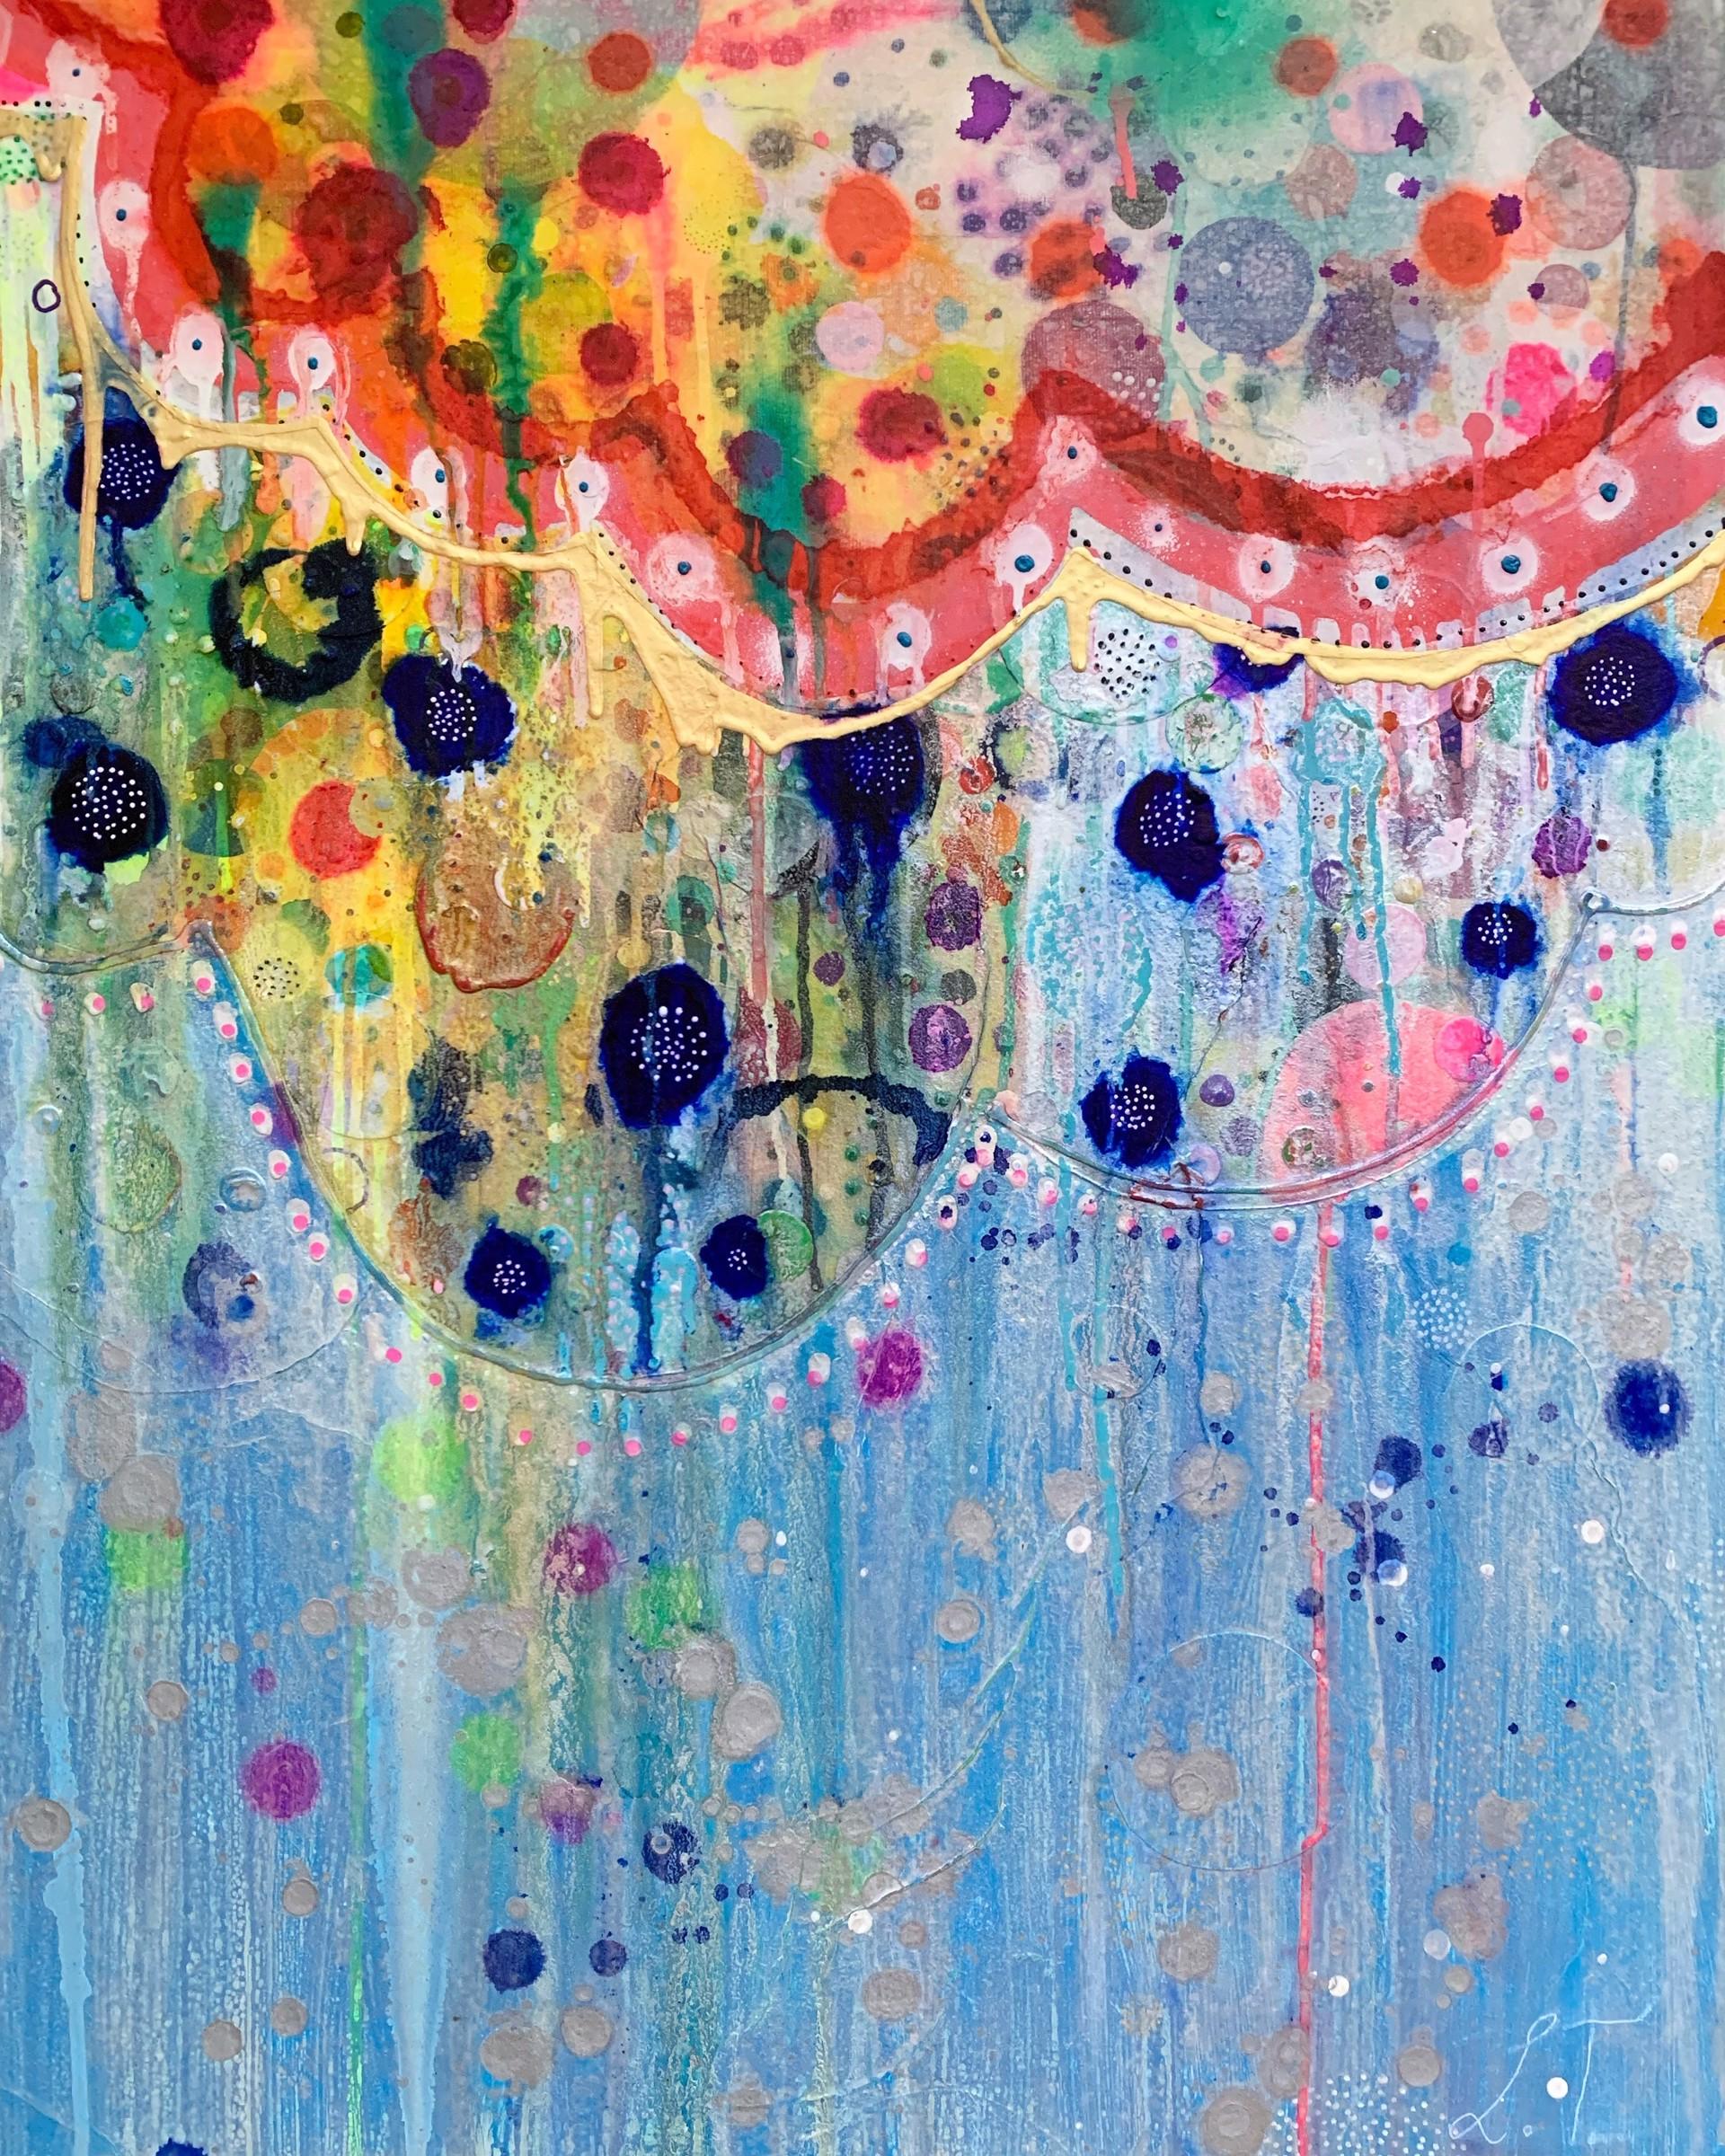 Bluescape by Liz Tran